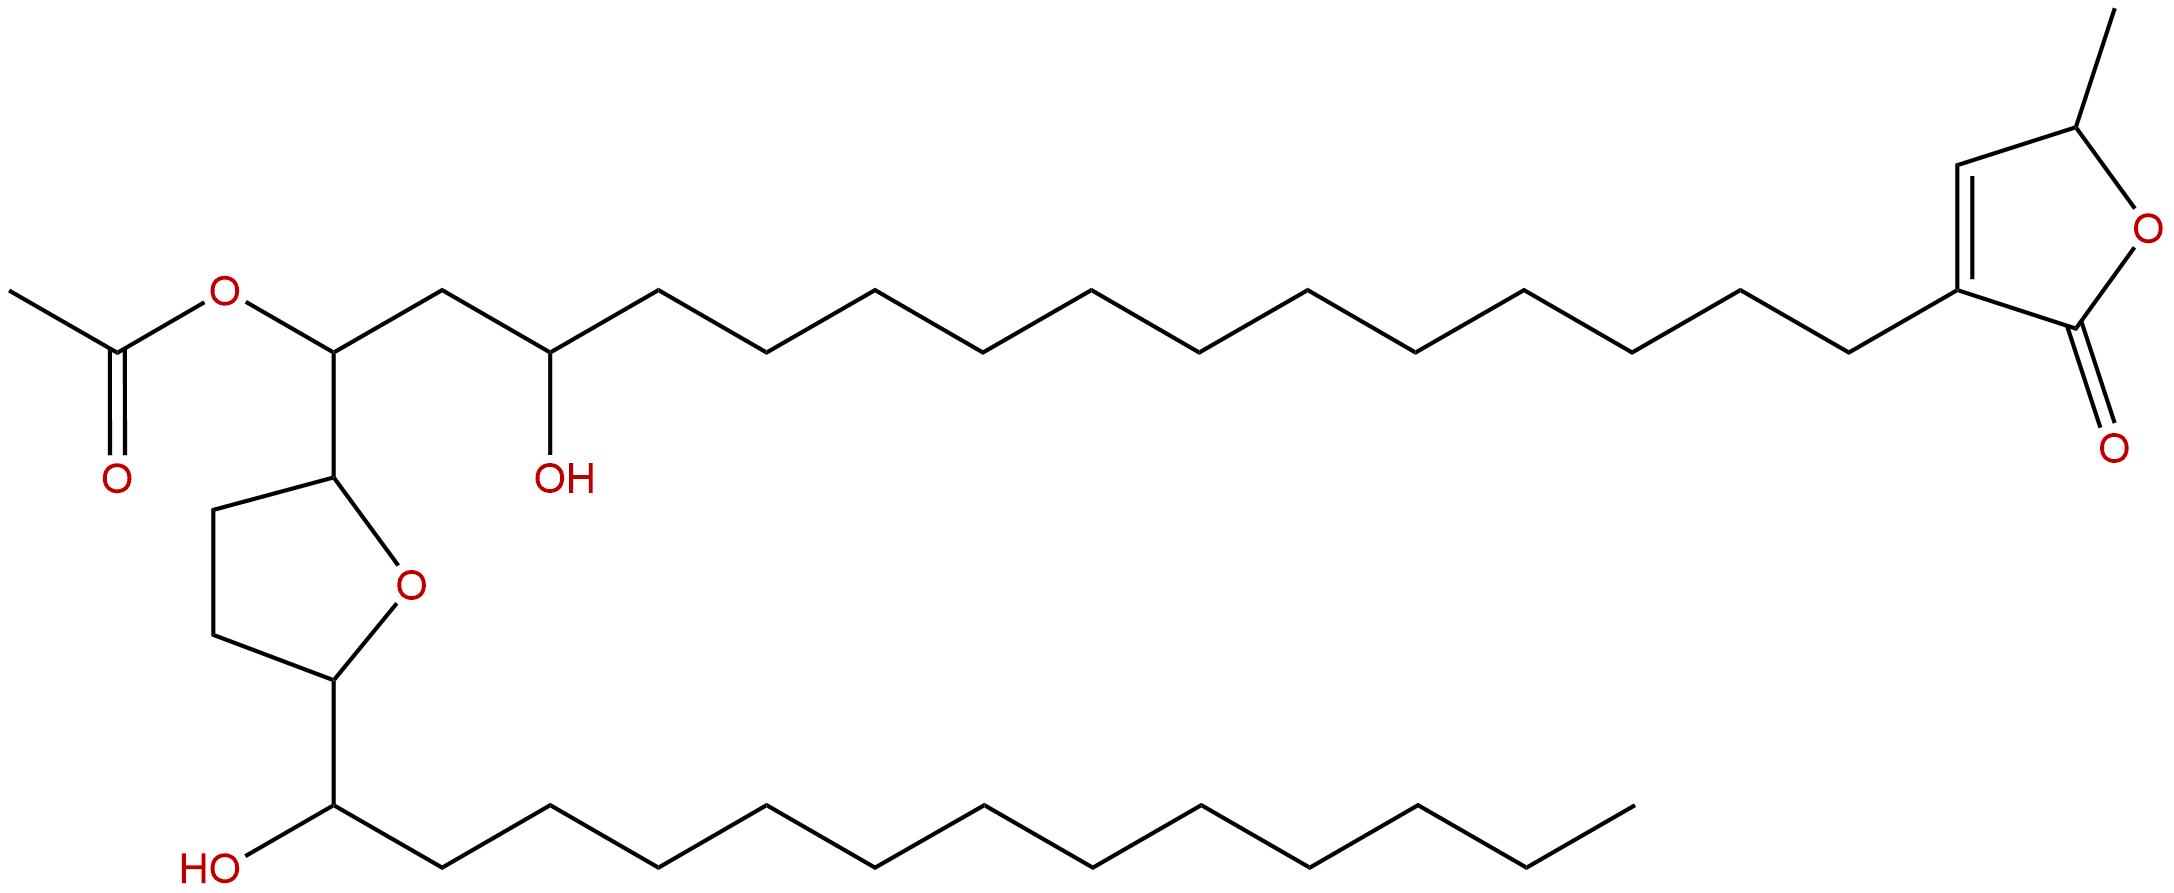 Uvarimacrophin A